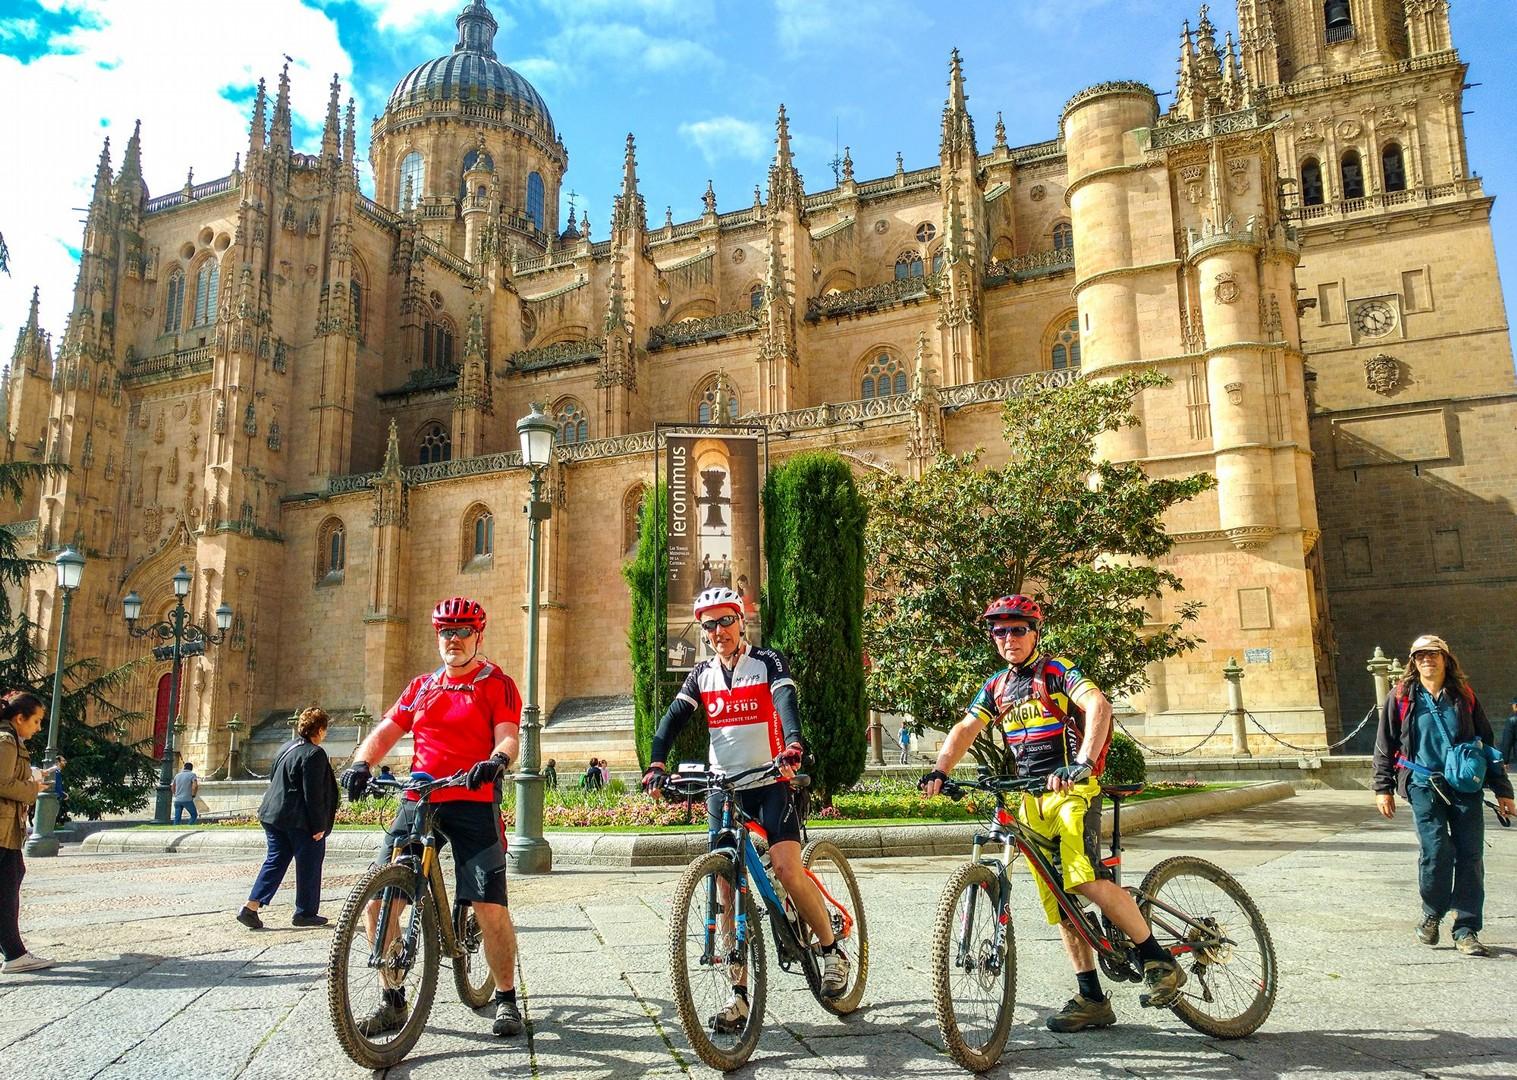 IMG_20170514_102635117.jpg - Spain - Ruta de la Plata - Guided Mountain Bike Holiday - Mountain Biking